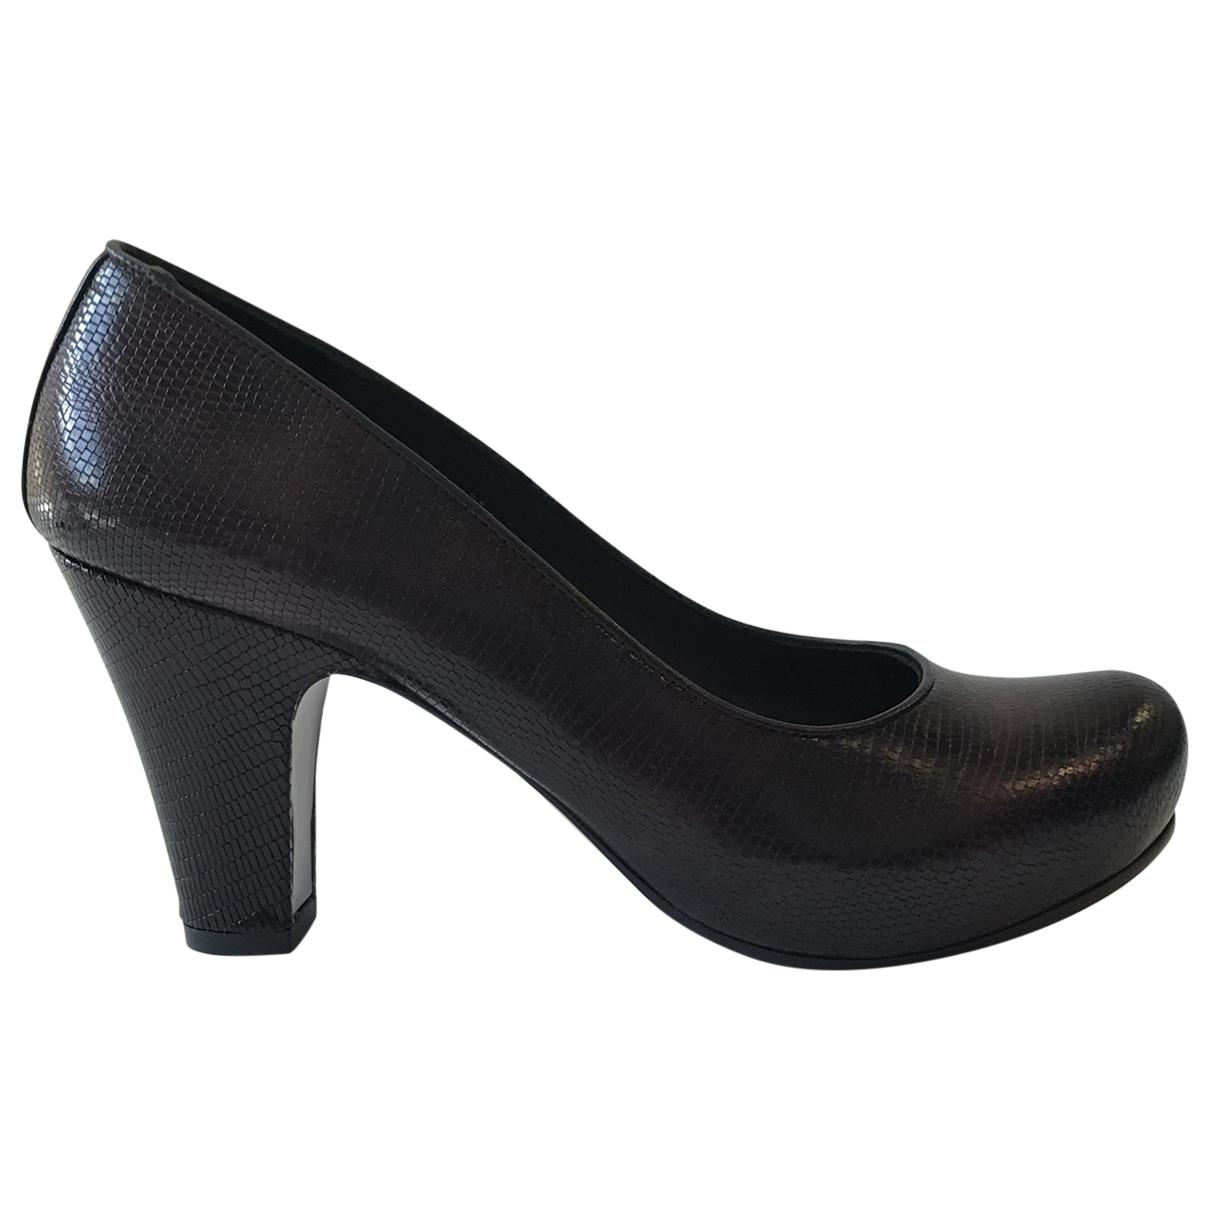 Chie Mihara \N Burgundy Leather Heels for Women 37.5 EU